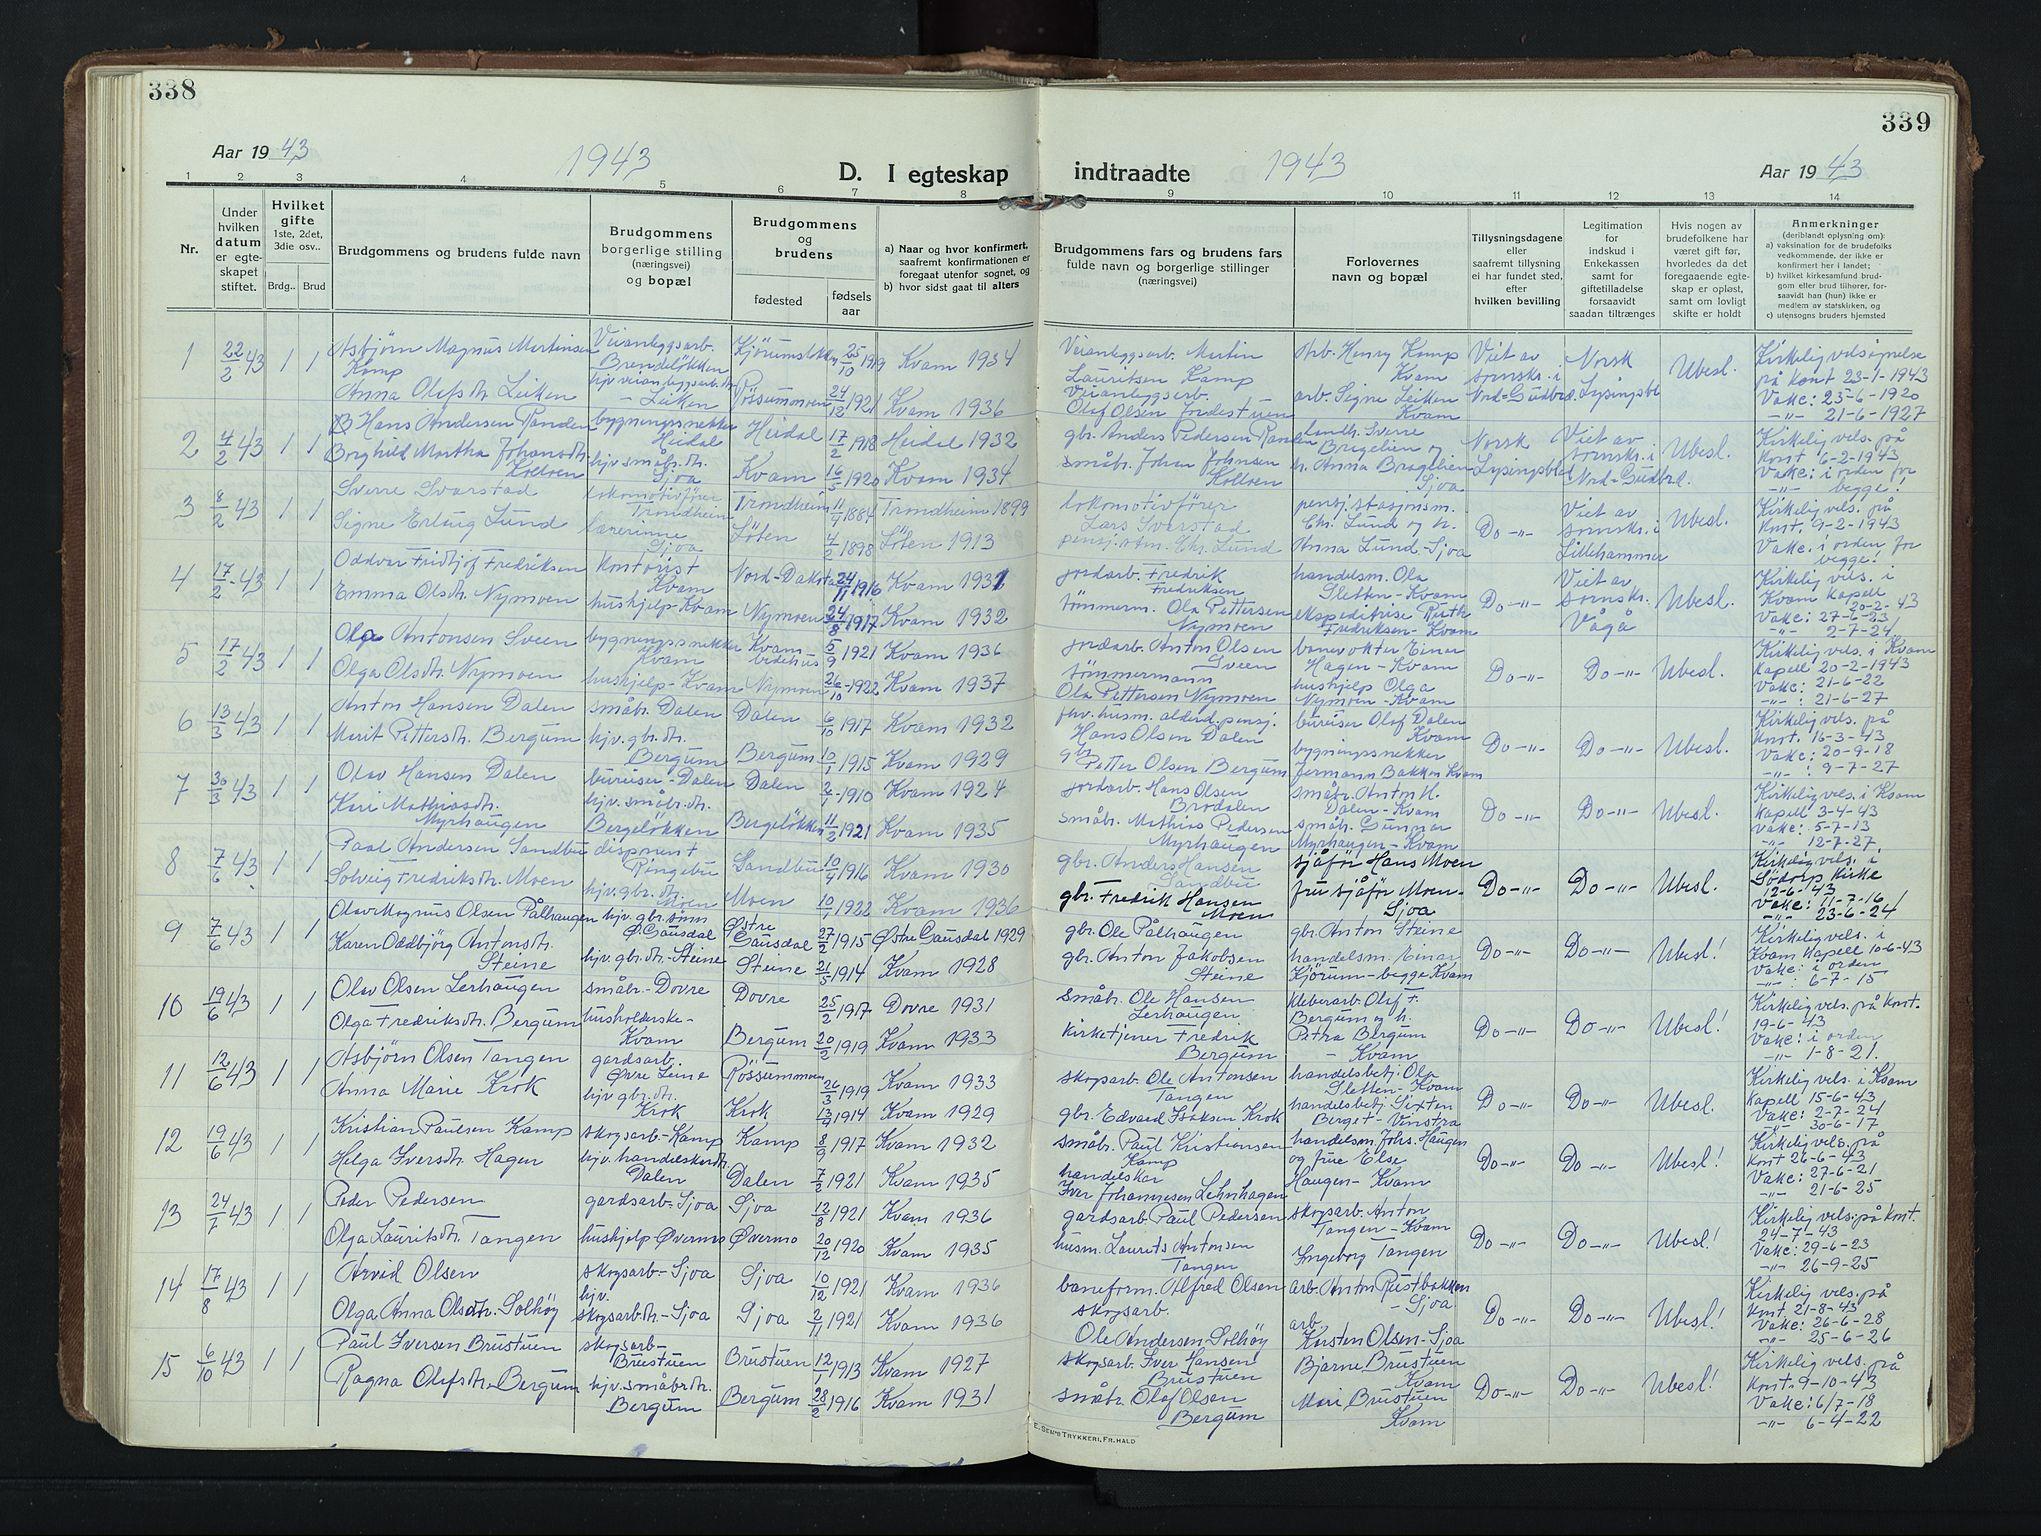 SAH, Nord-Fron prestekontor, Klokkerbok nr. 8, 1915-1948, s. 338-339